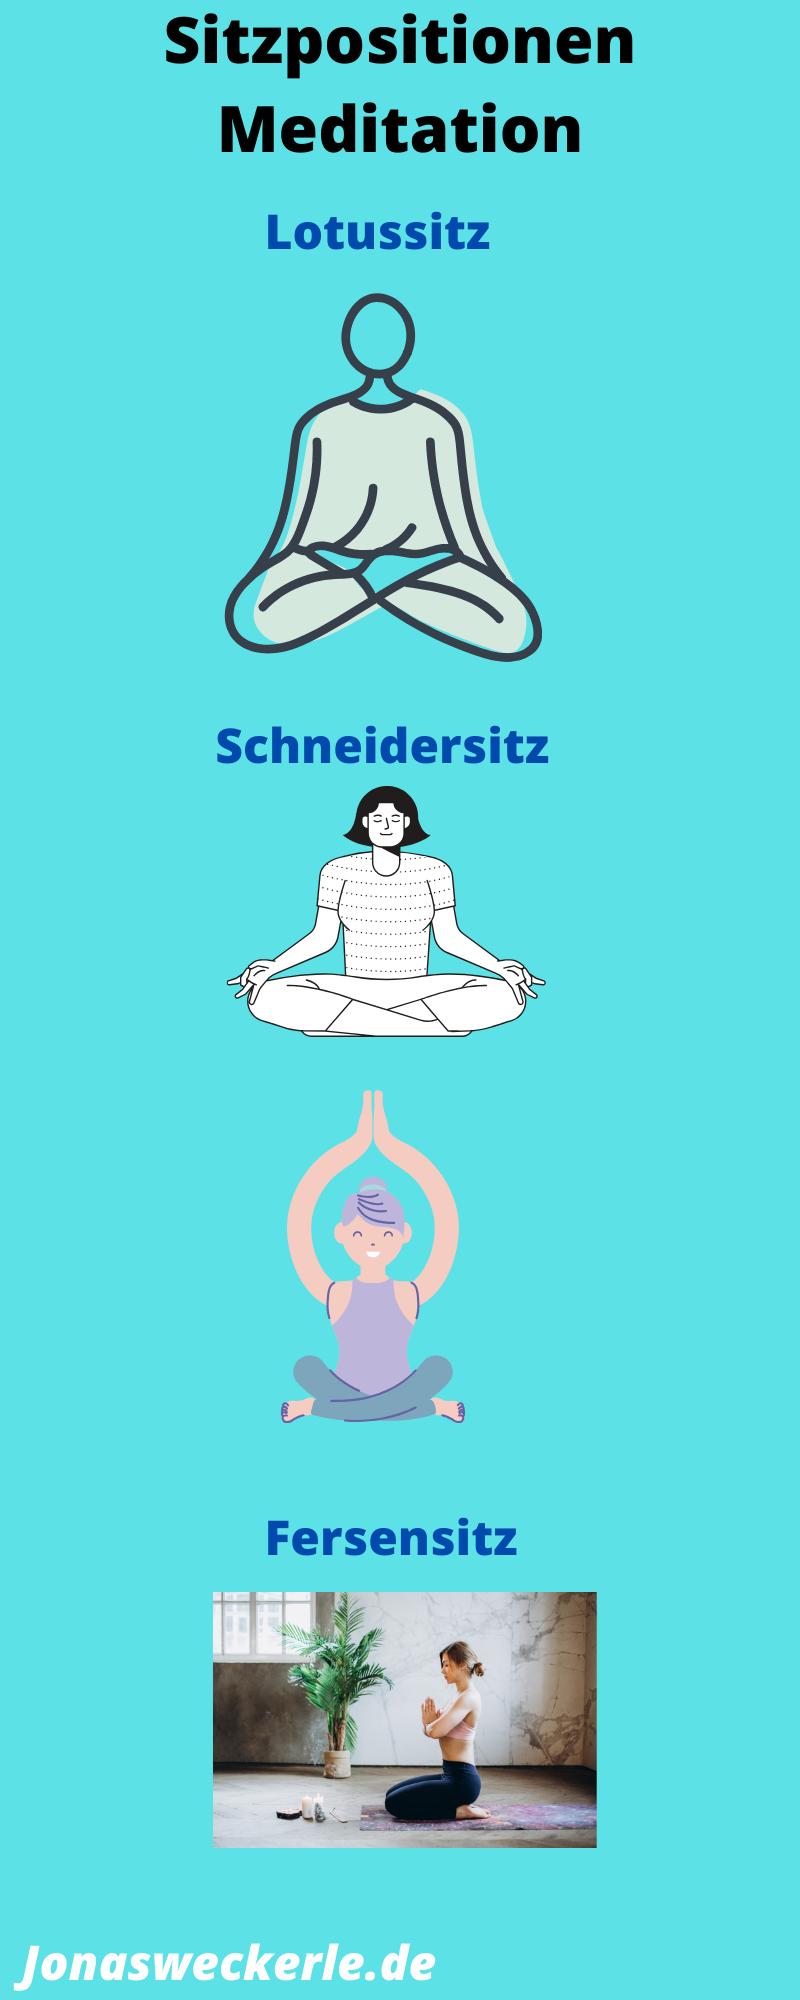 Meditieren sitzpositionen